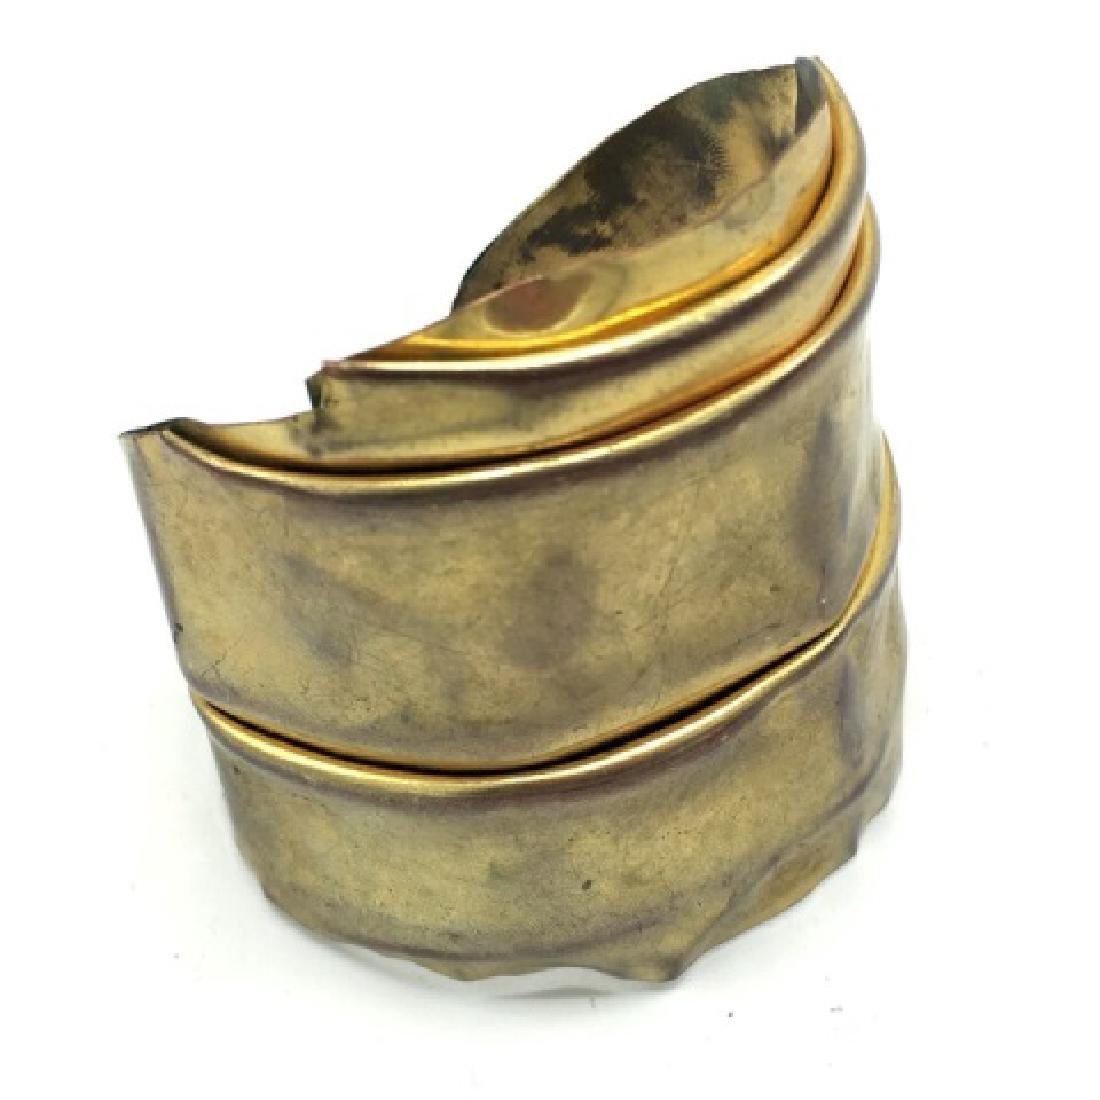 Costume Jewelry - Premier Etage Paris Gold Cuff - 2